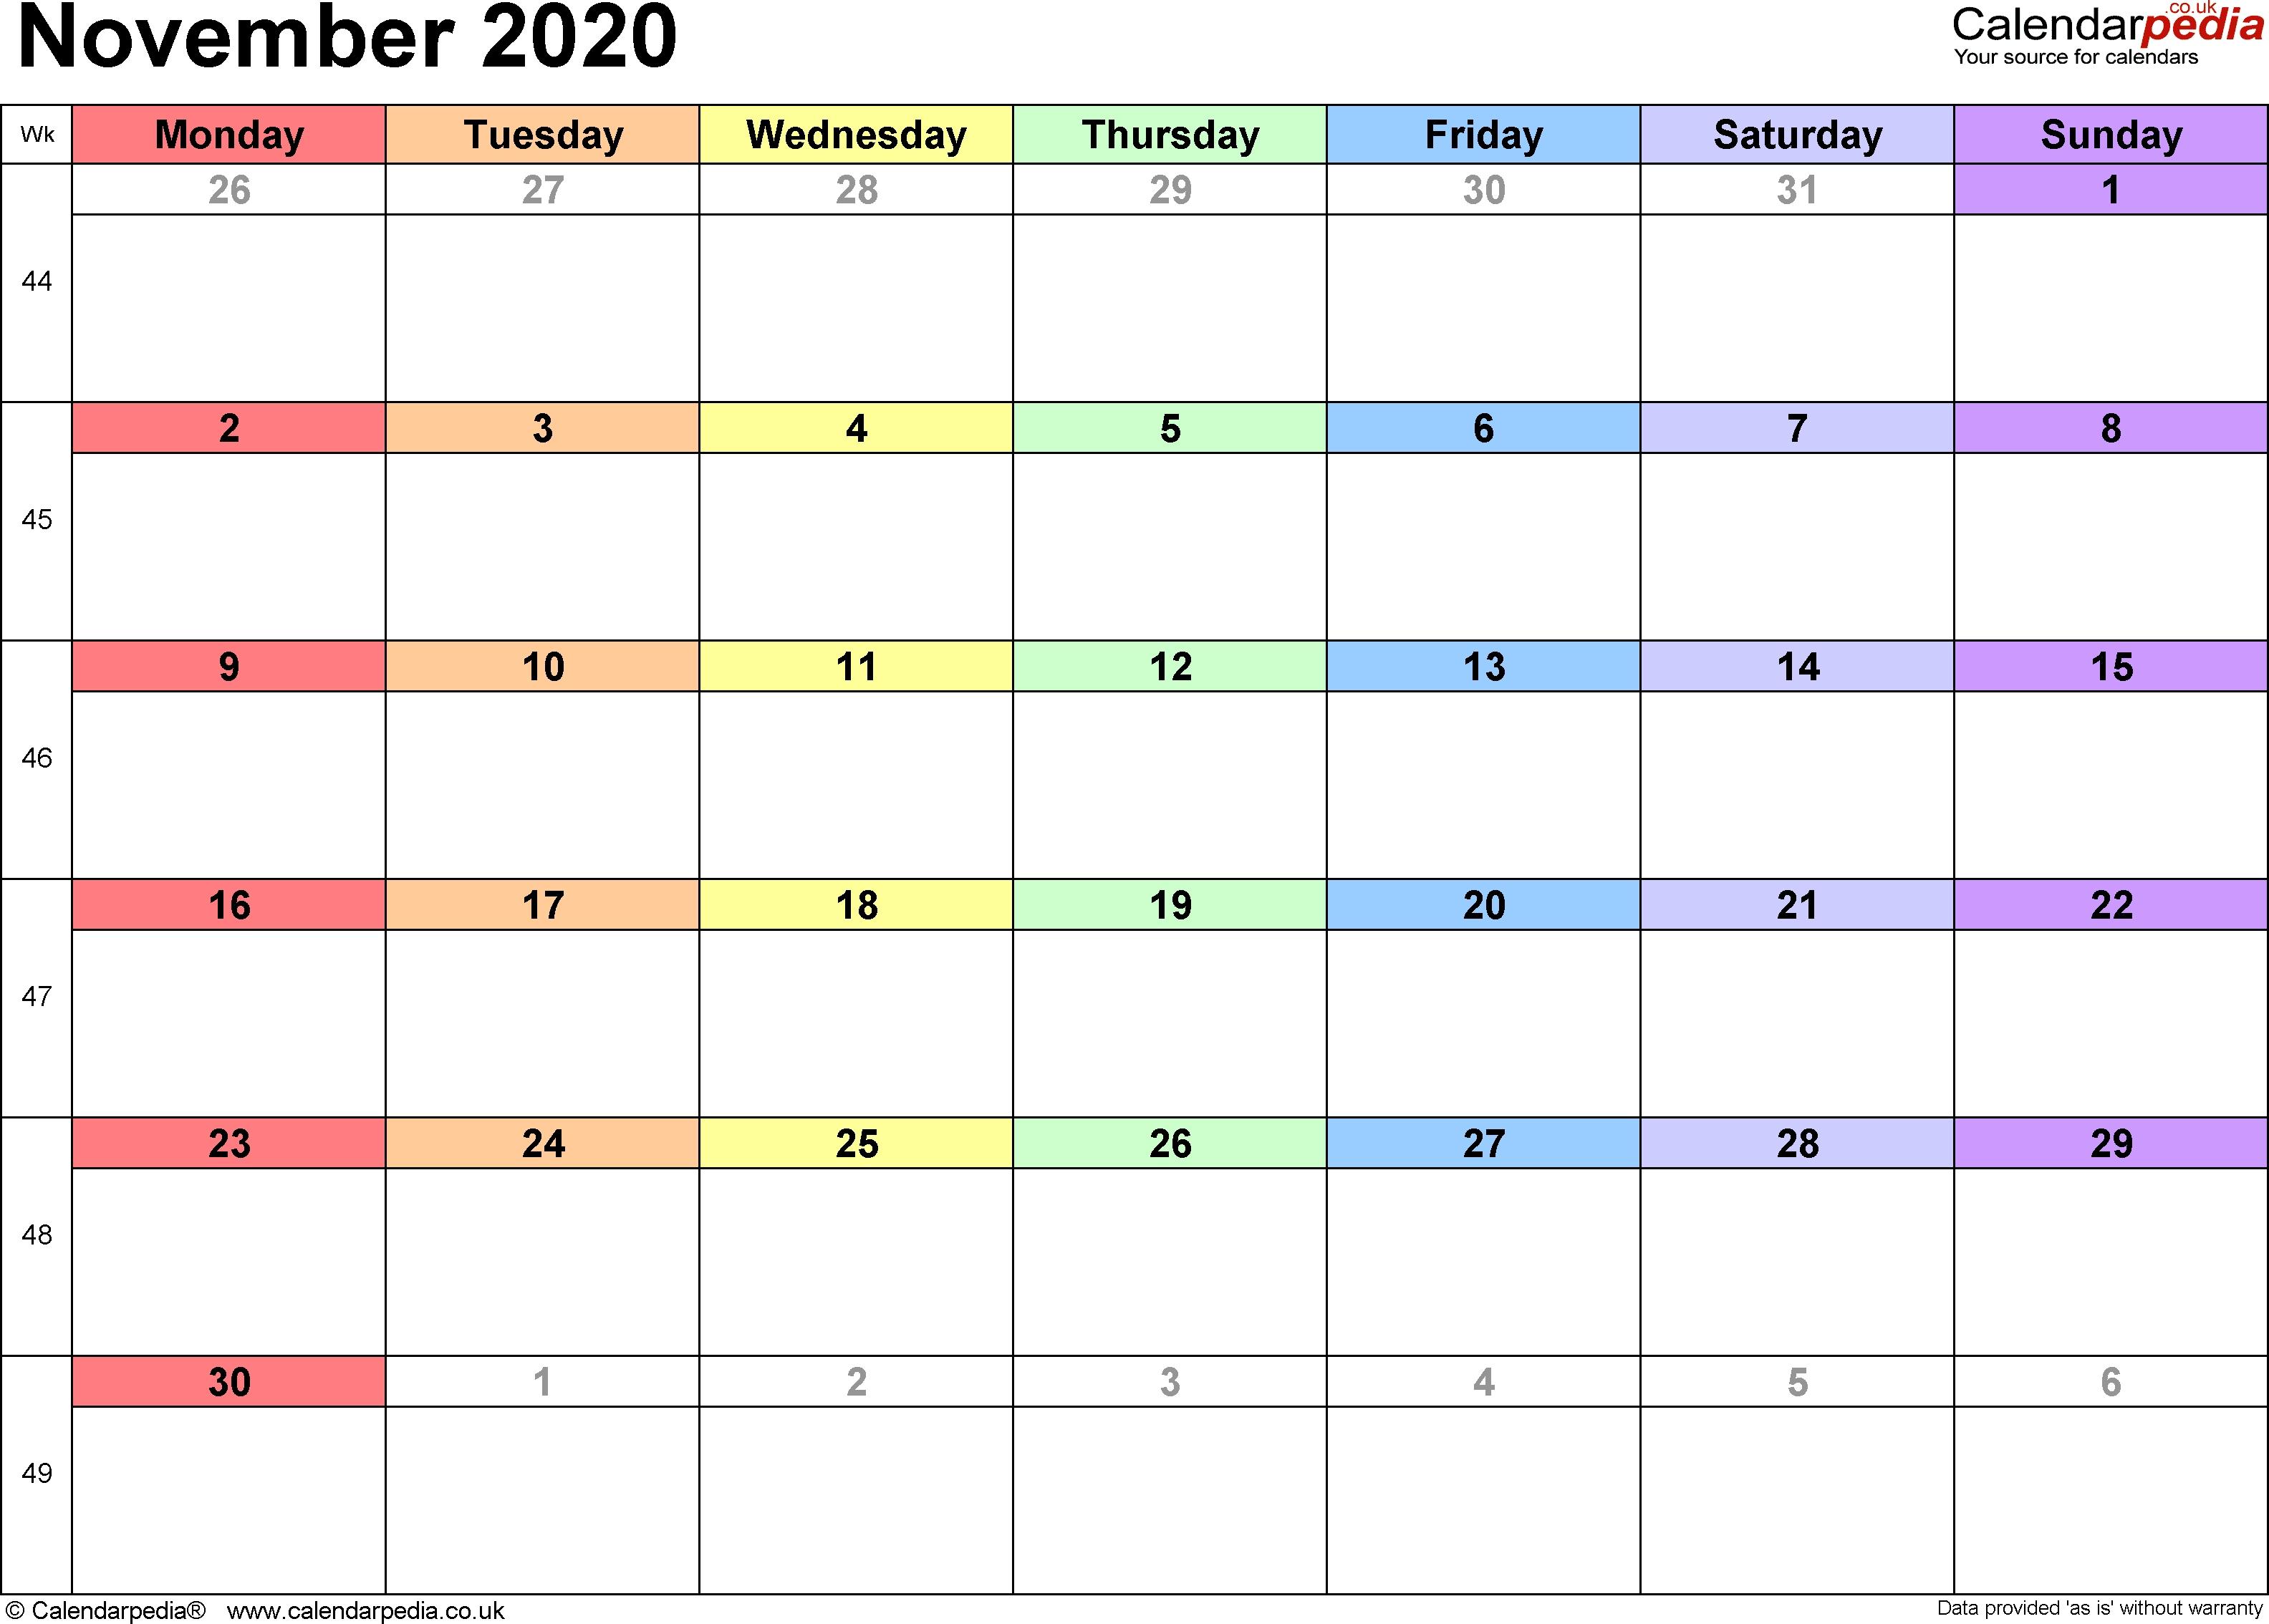 November 3 2020 Calendar